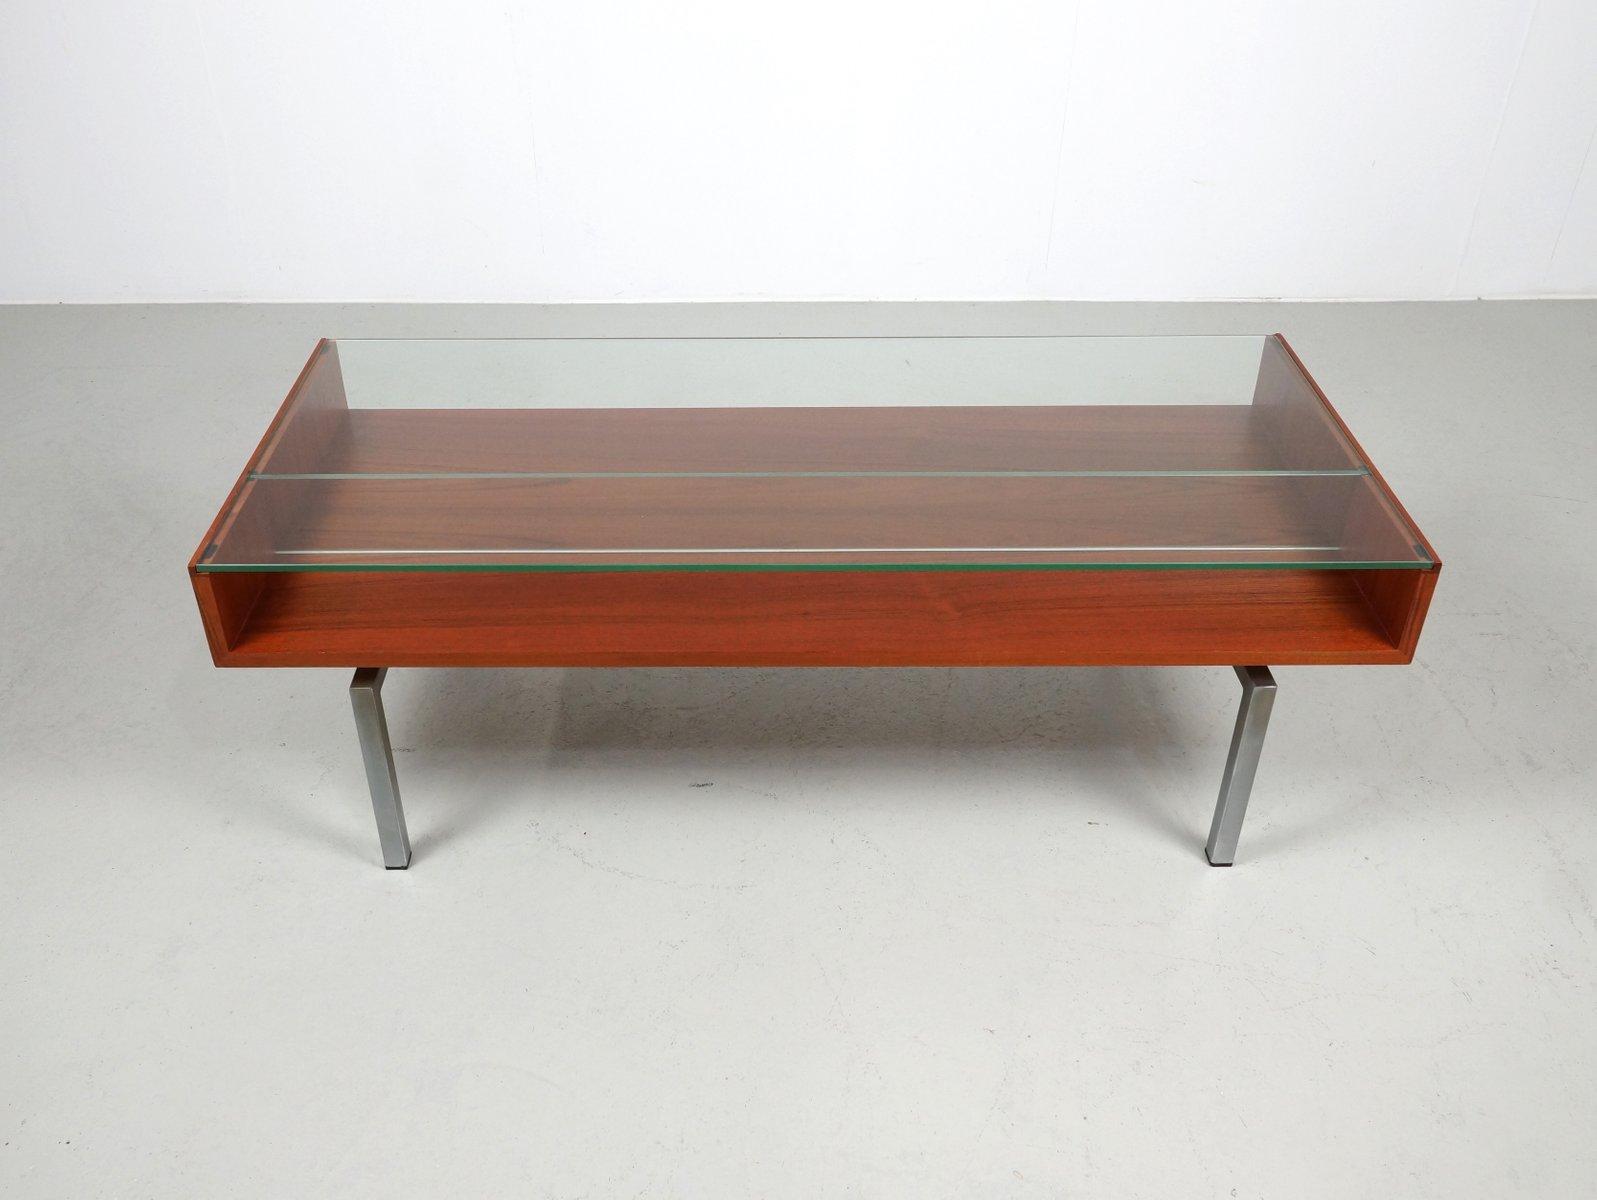 table basse vintage en teck et verre en vente sur pamono. Black Bedroom Furniture Sets. Home Design Ideas